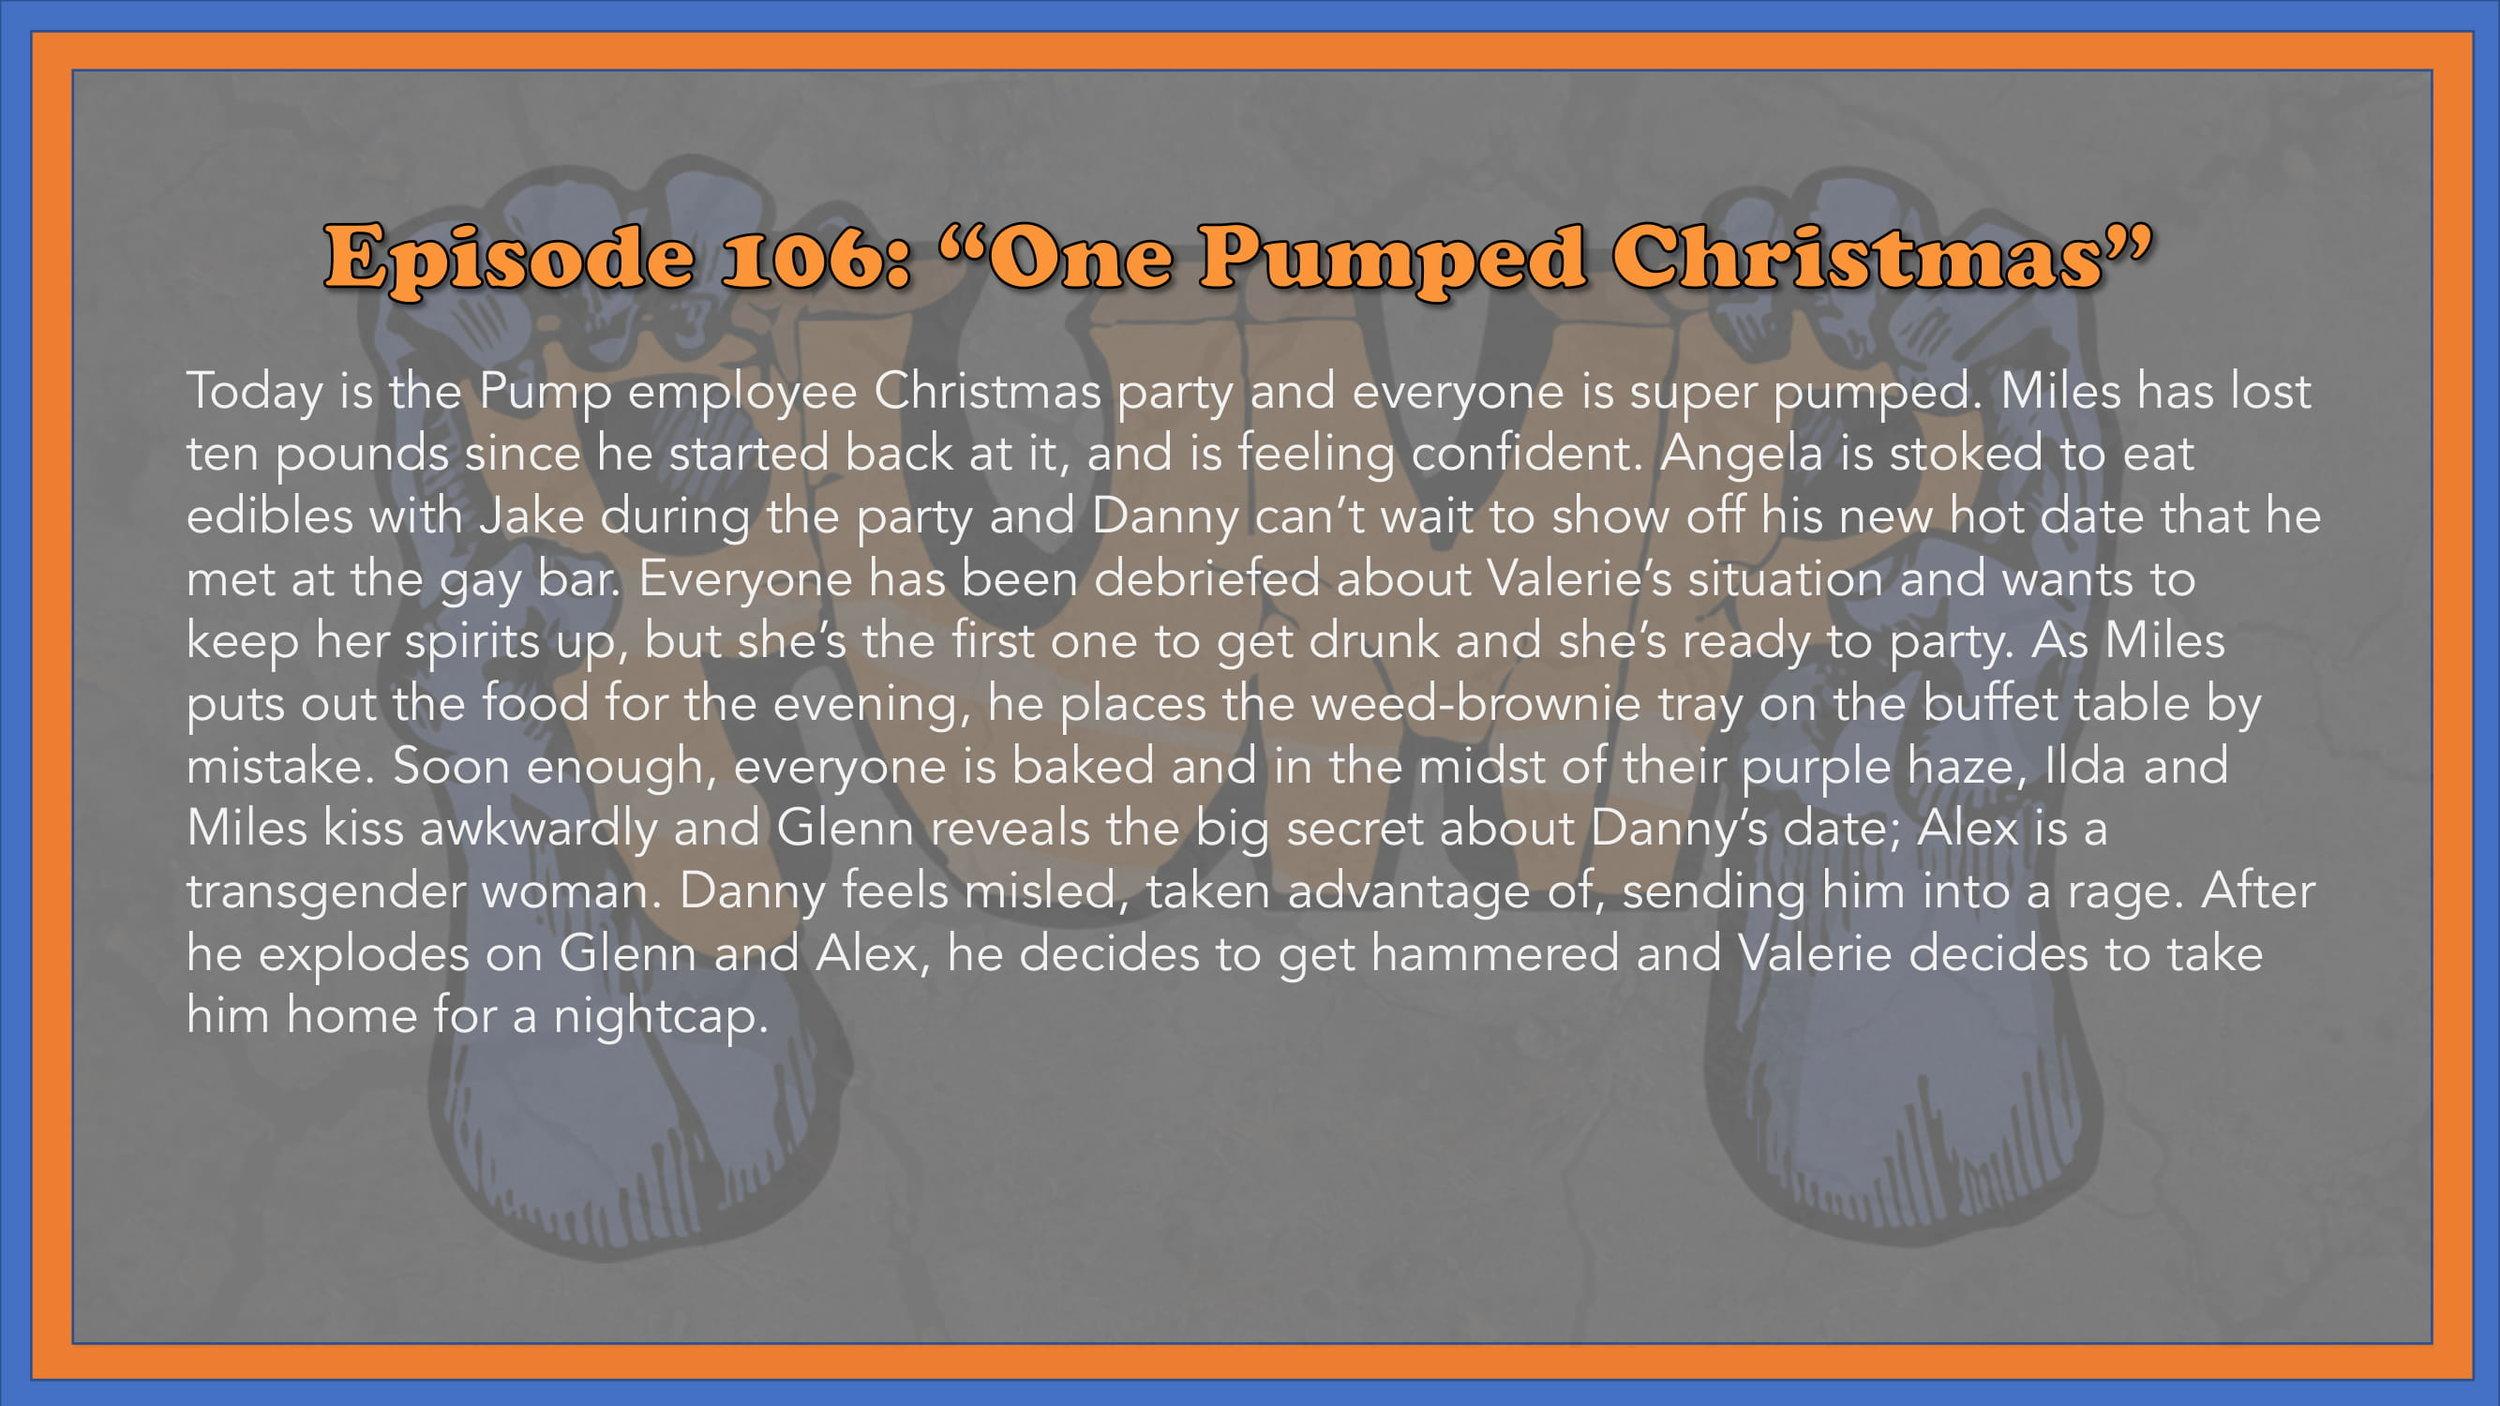 Pump Episode Outlines Season One 120618-7.jpg